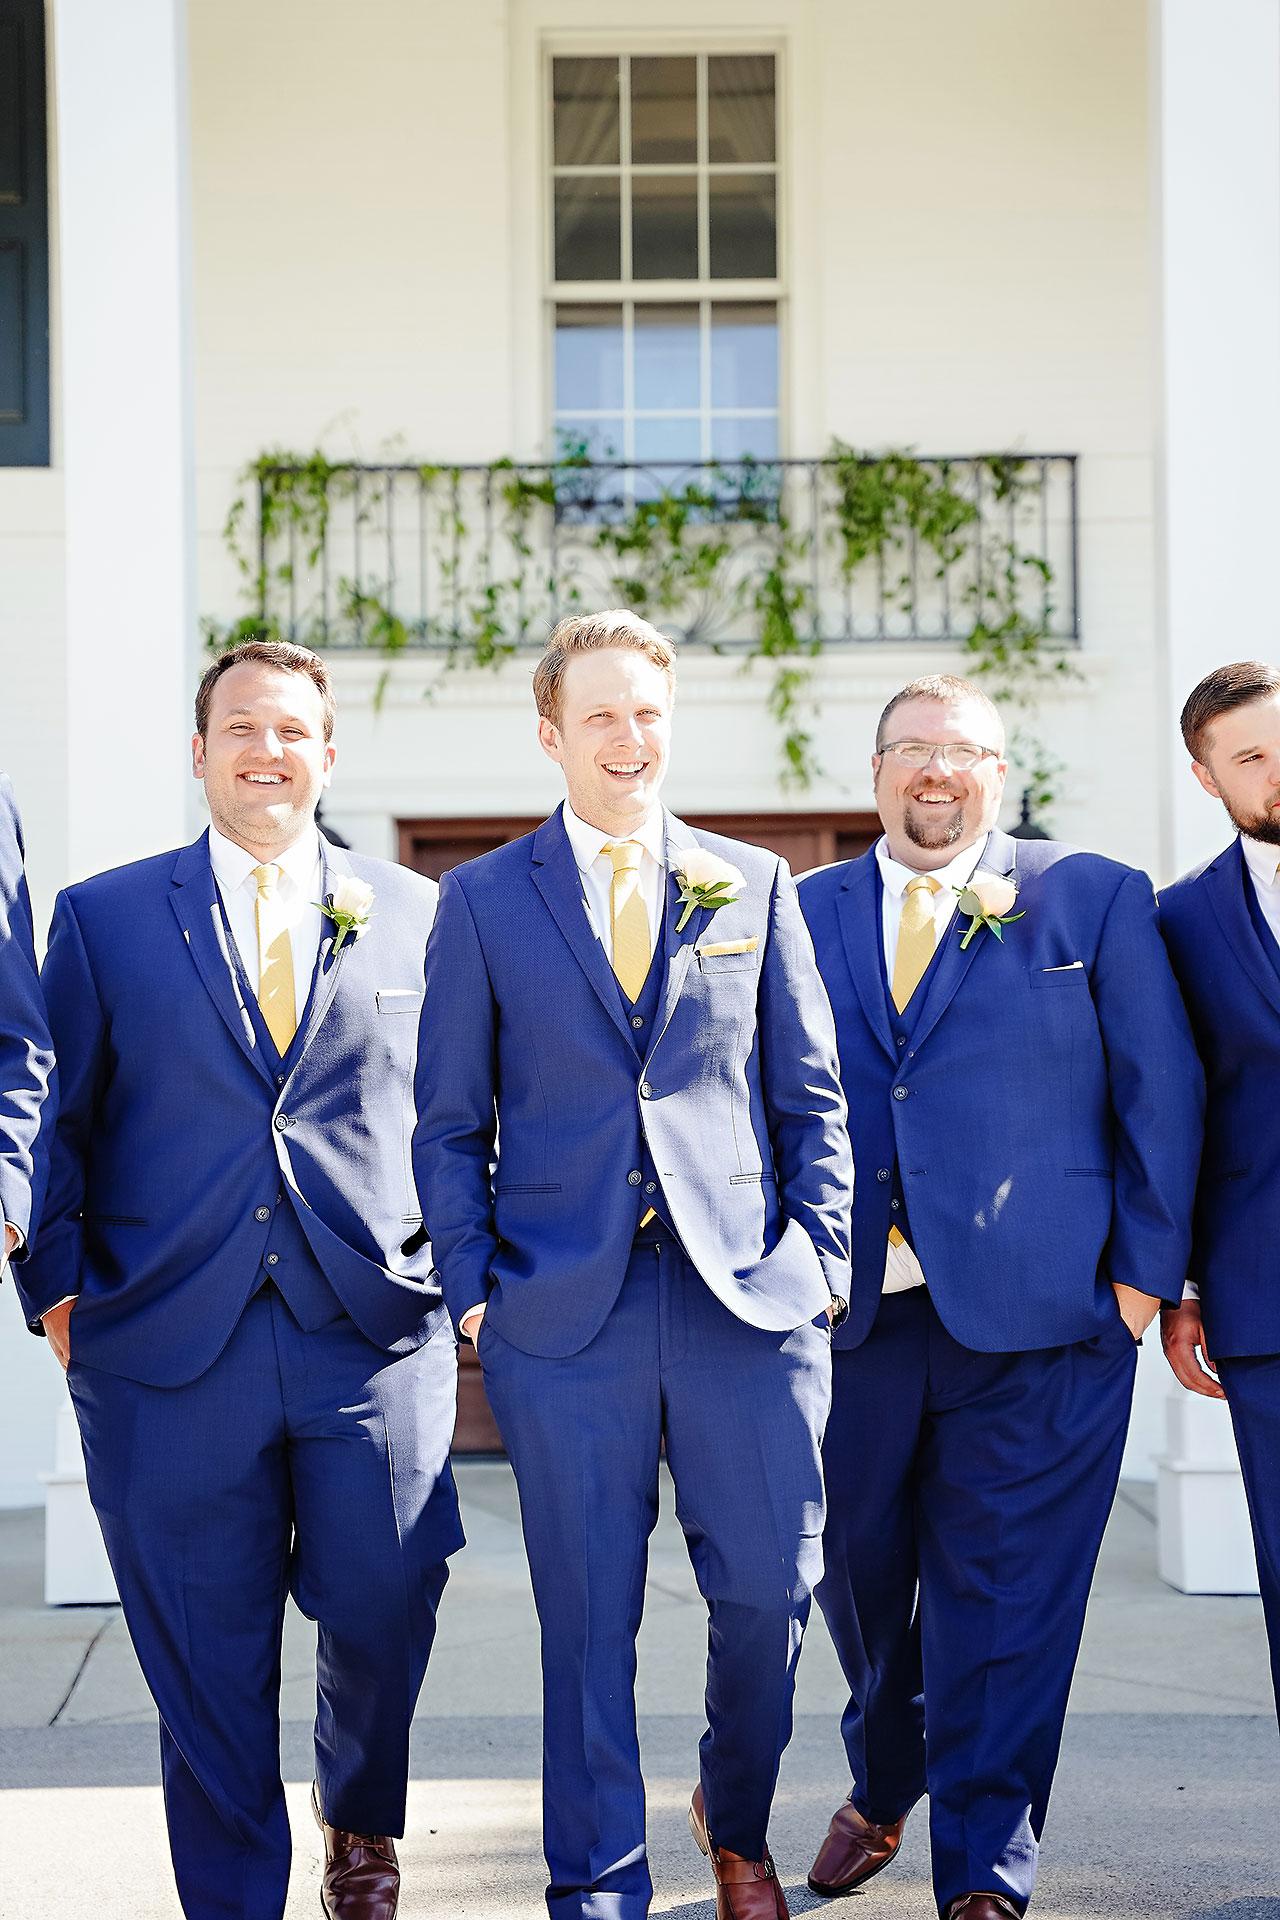 Nadia Parker Black Iris Estate Carmel Indiana Wedding May 2021 144